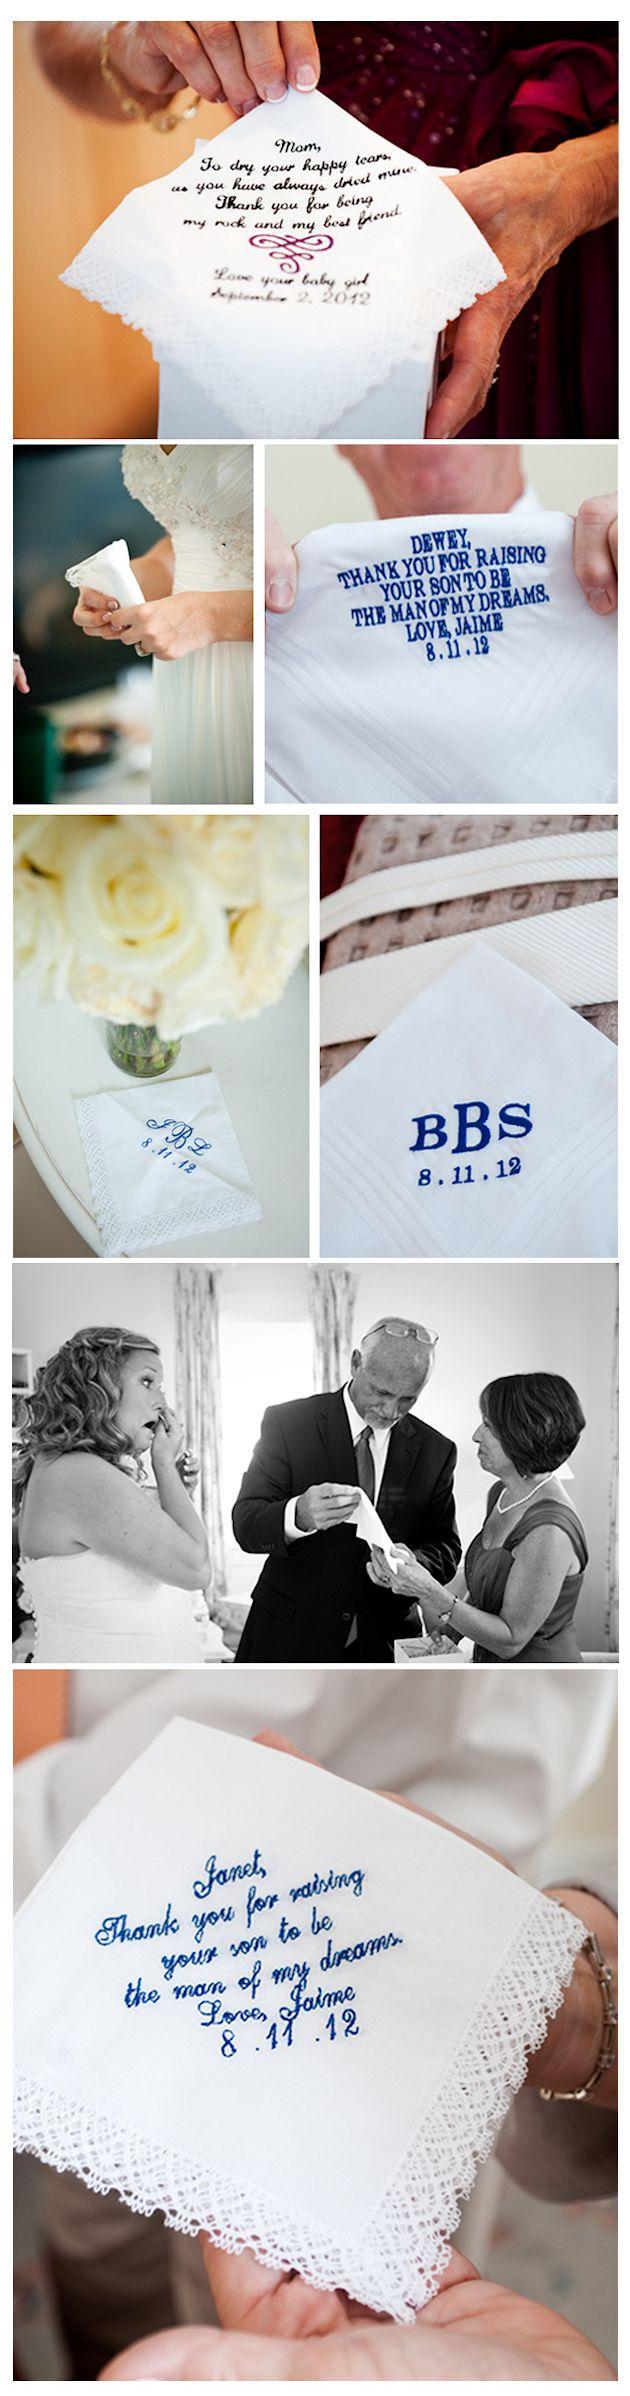 Eastern Shore Wedding Details - Personalized Handkerchiefs